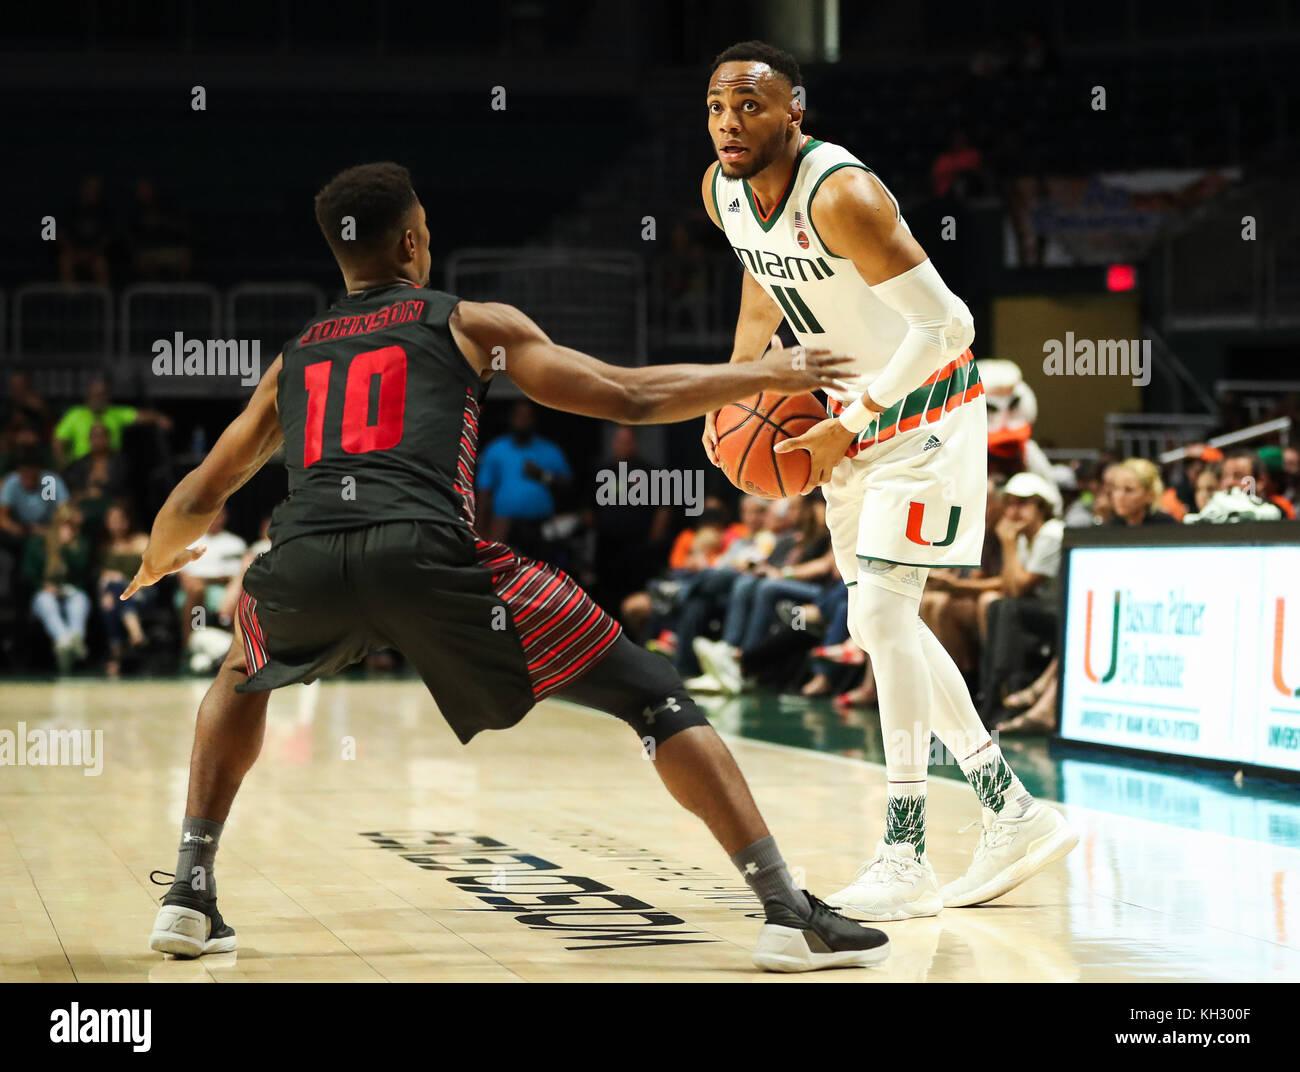 Nate Johnson Basketball Miami Beach